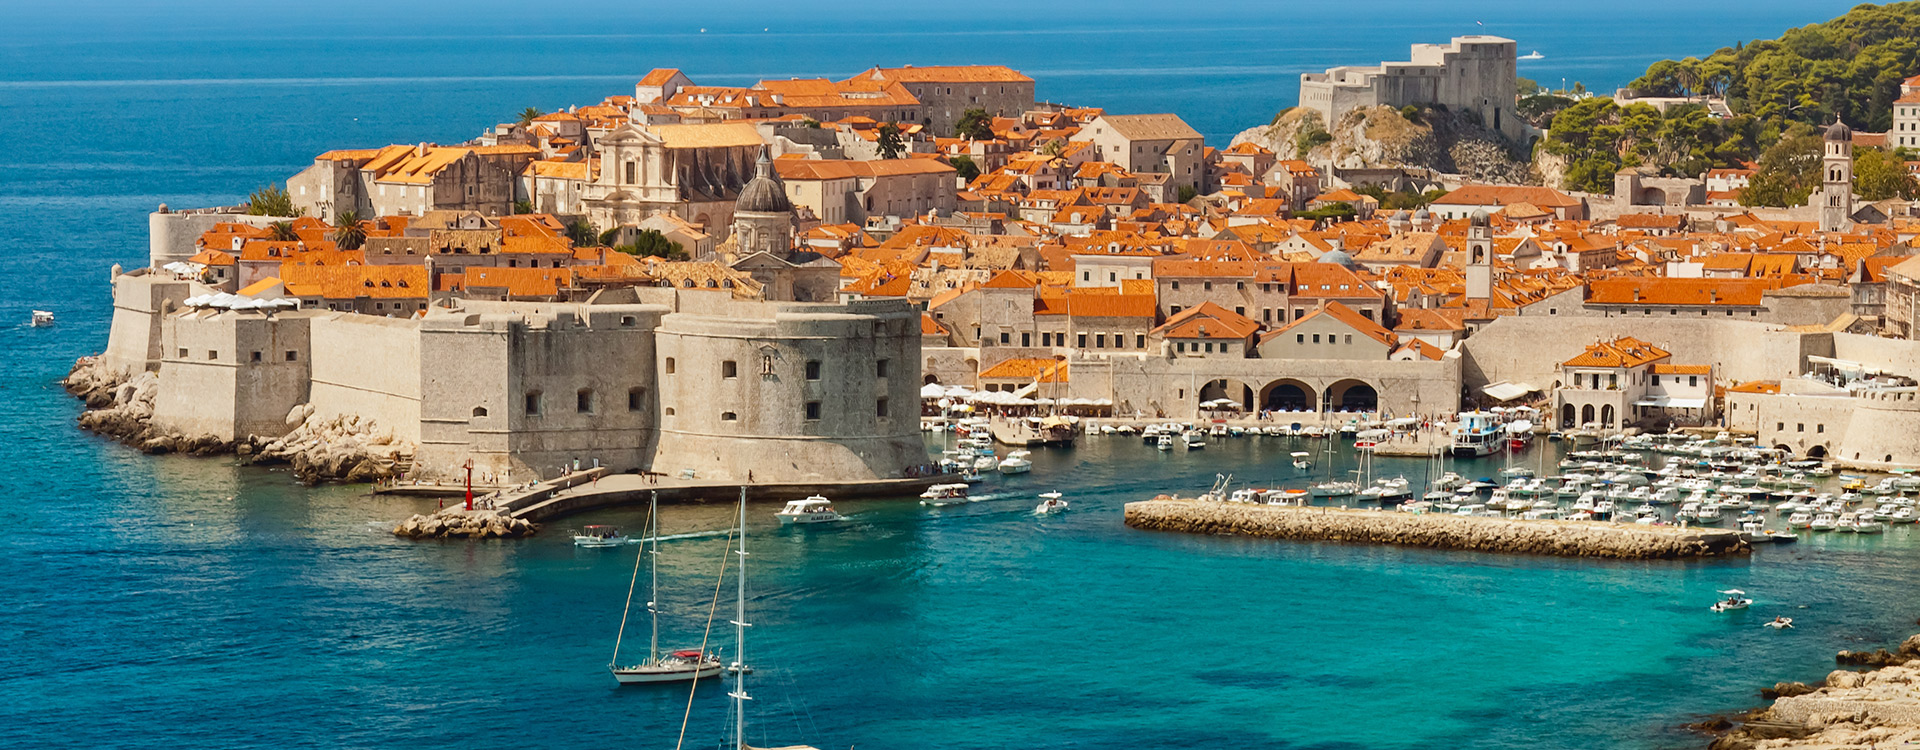 Croatia_Dubrovnik